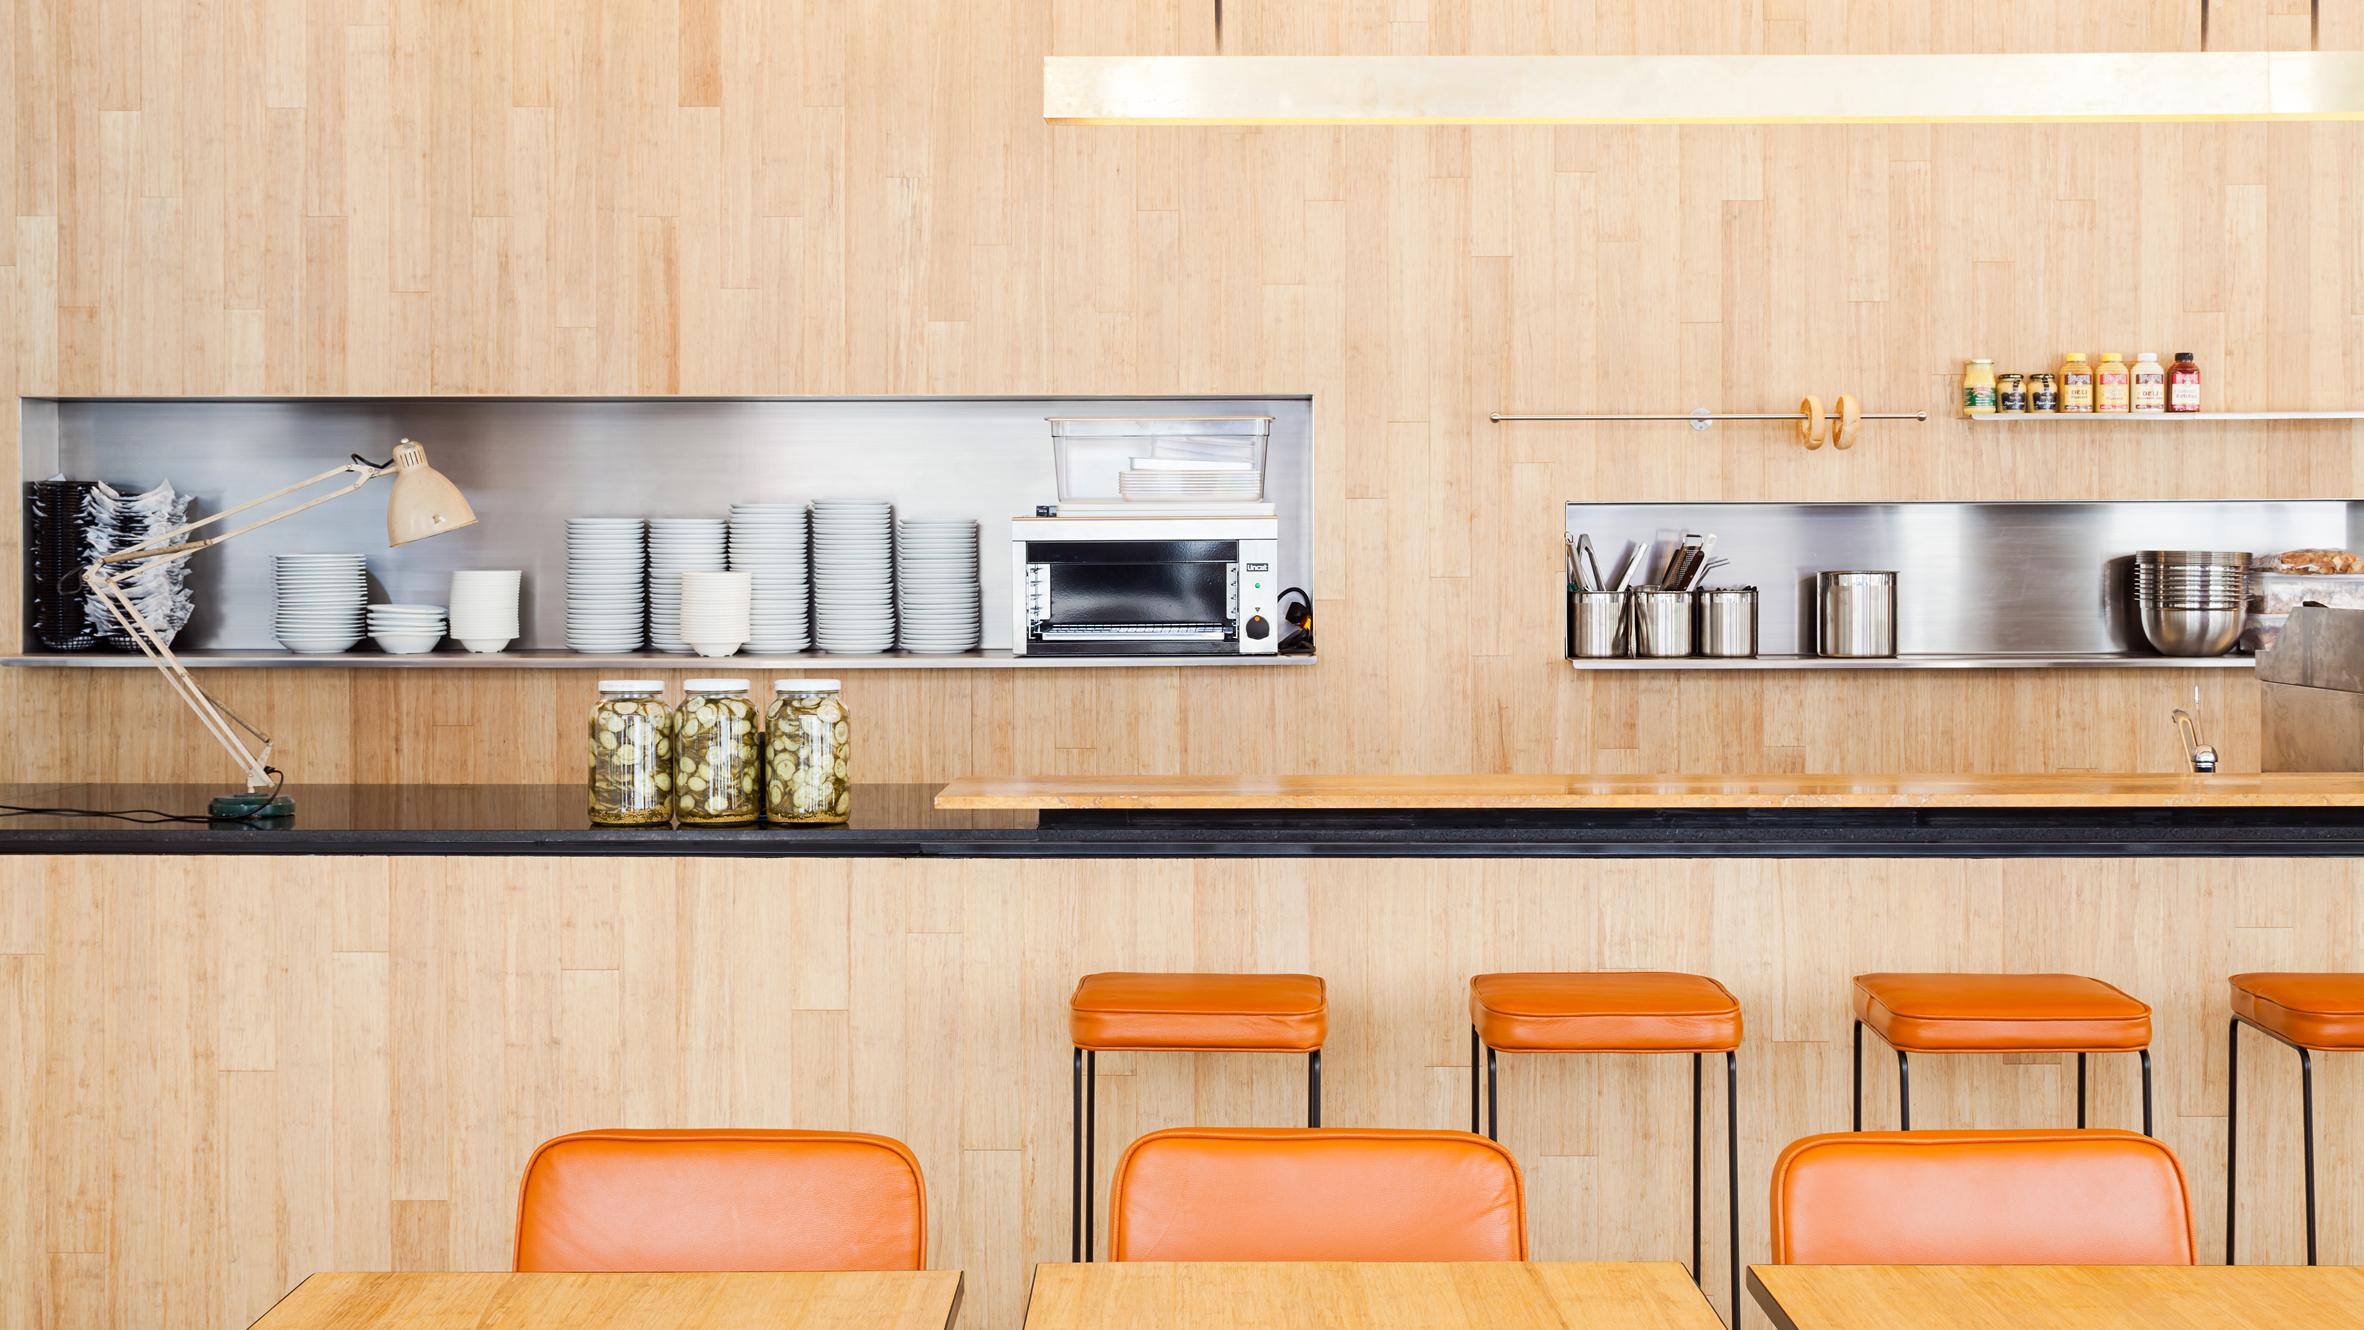 kogan furniture. São Paulo\u0027s 1950s Eateries Influence Deli At Institute Of Architects Brazil Kogan Furniture